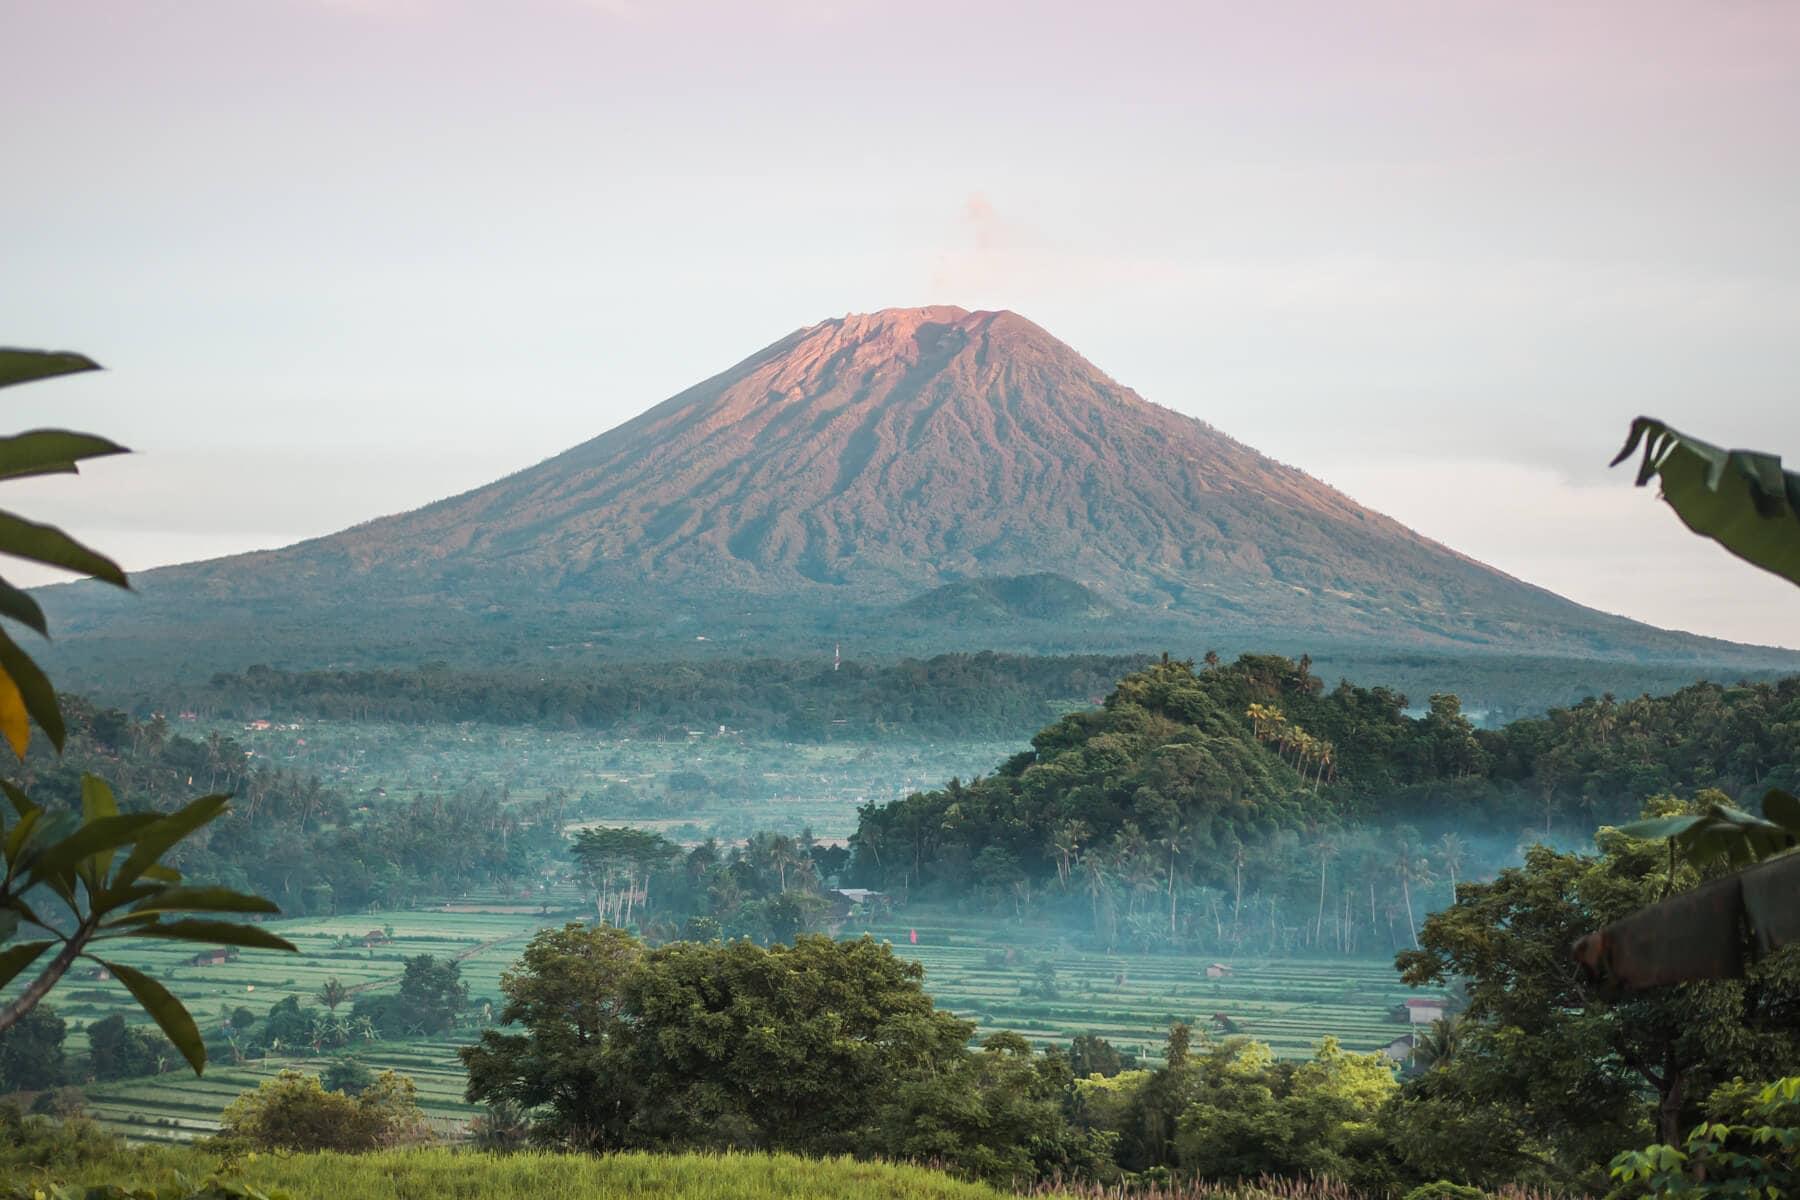 Bukit Cinta in East Bali - Where to find the best Mount Agung sunrise viewpoint #bali #bucketlist #eastbali #travelinspo #indonesia